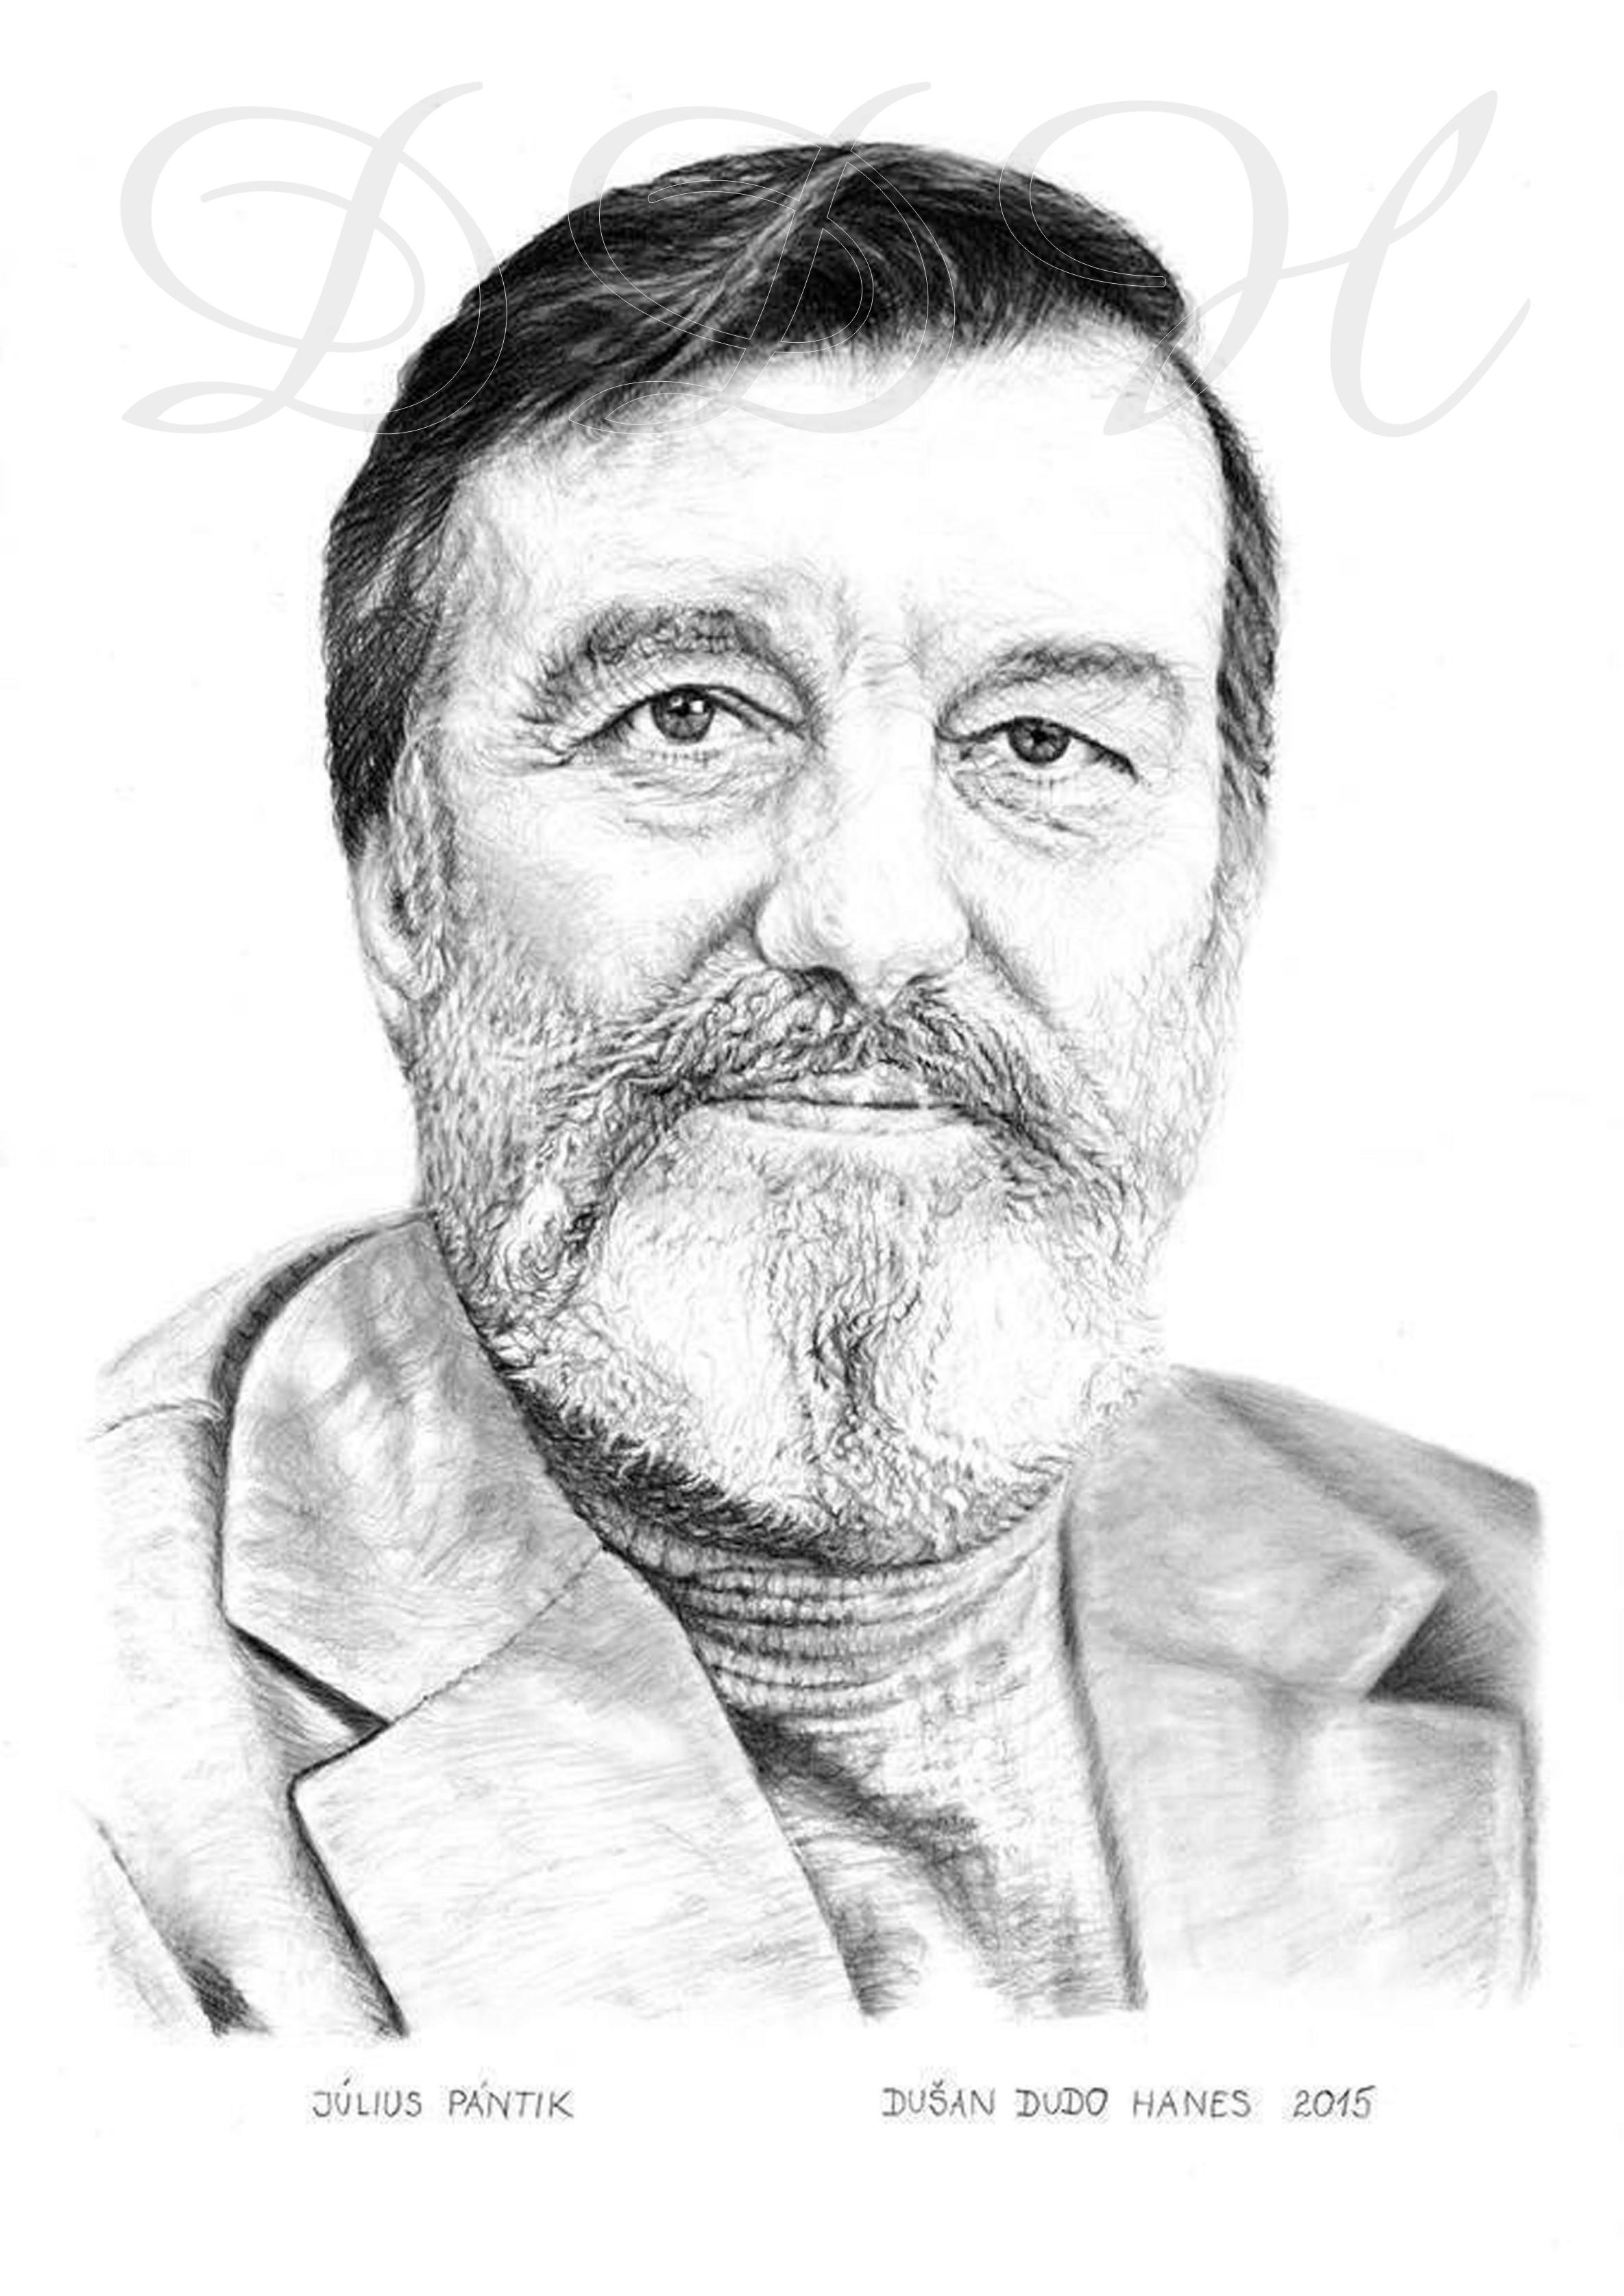 126 - Július Pántik, portrét Dušan Dudo Hanes